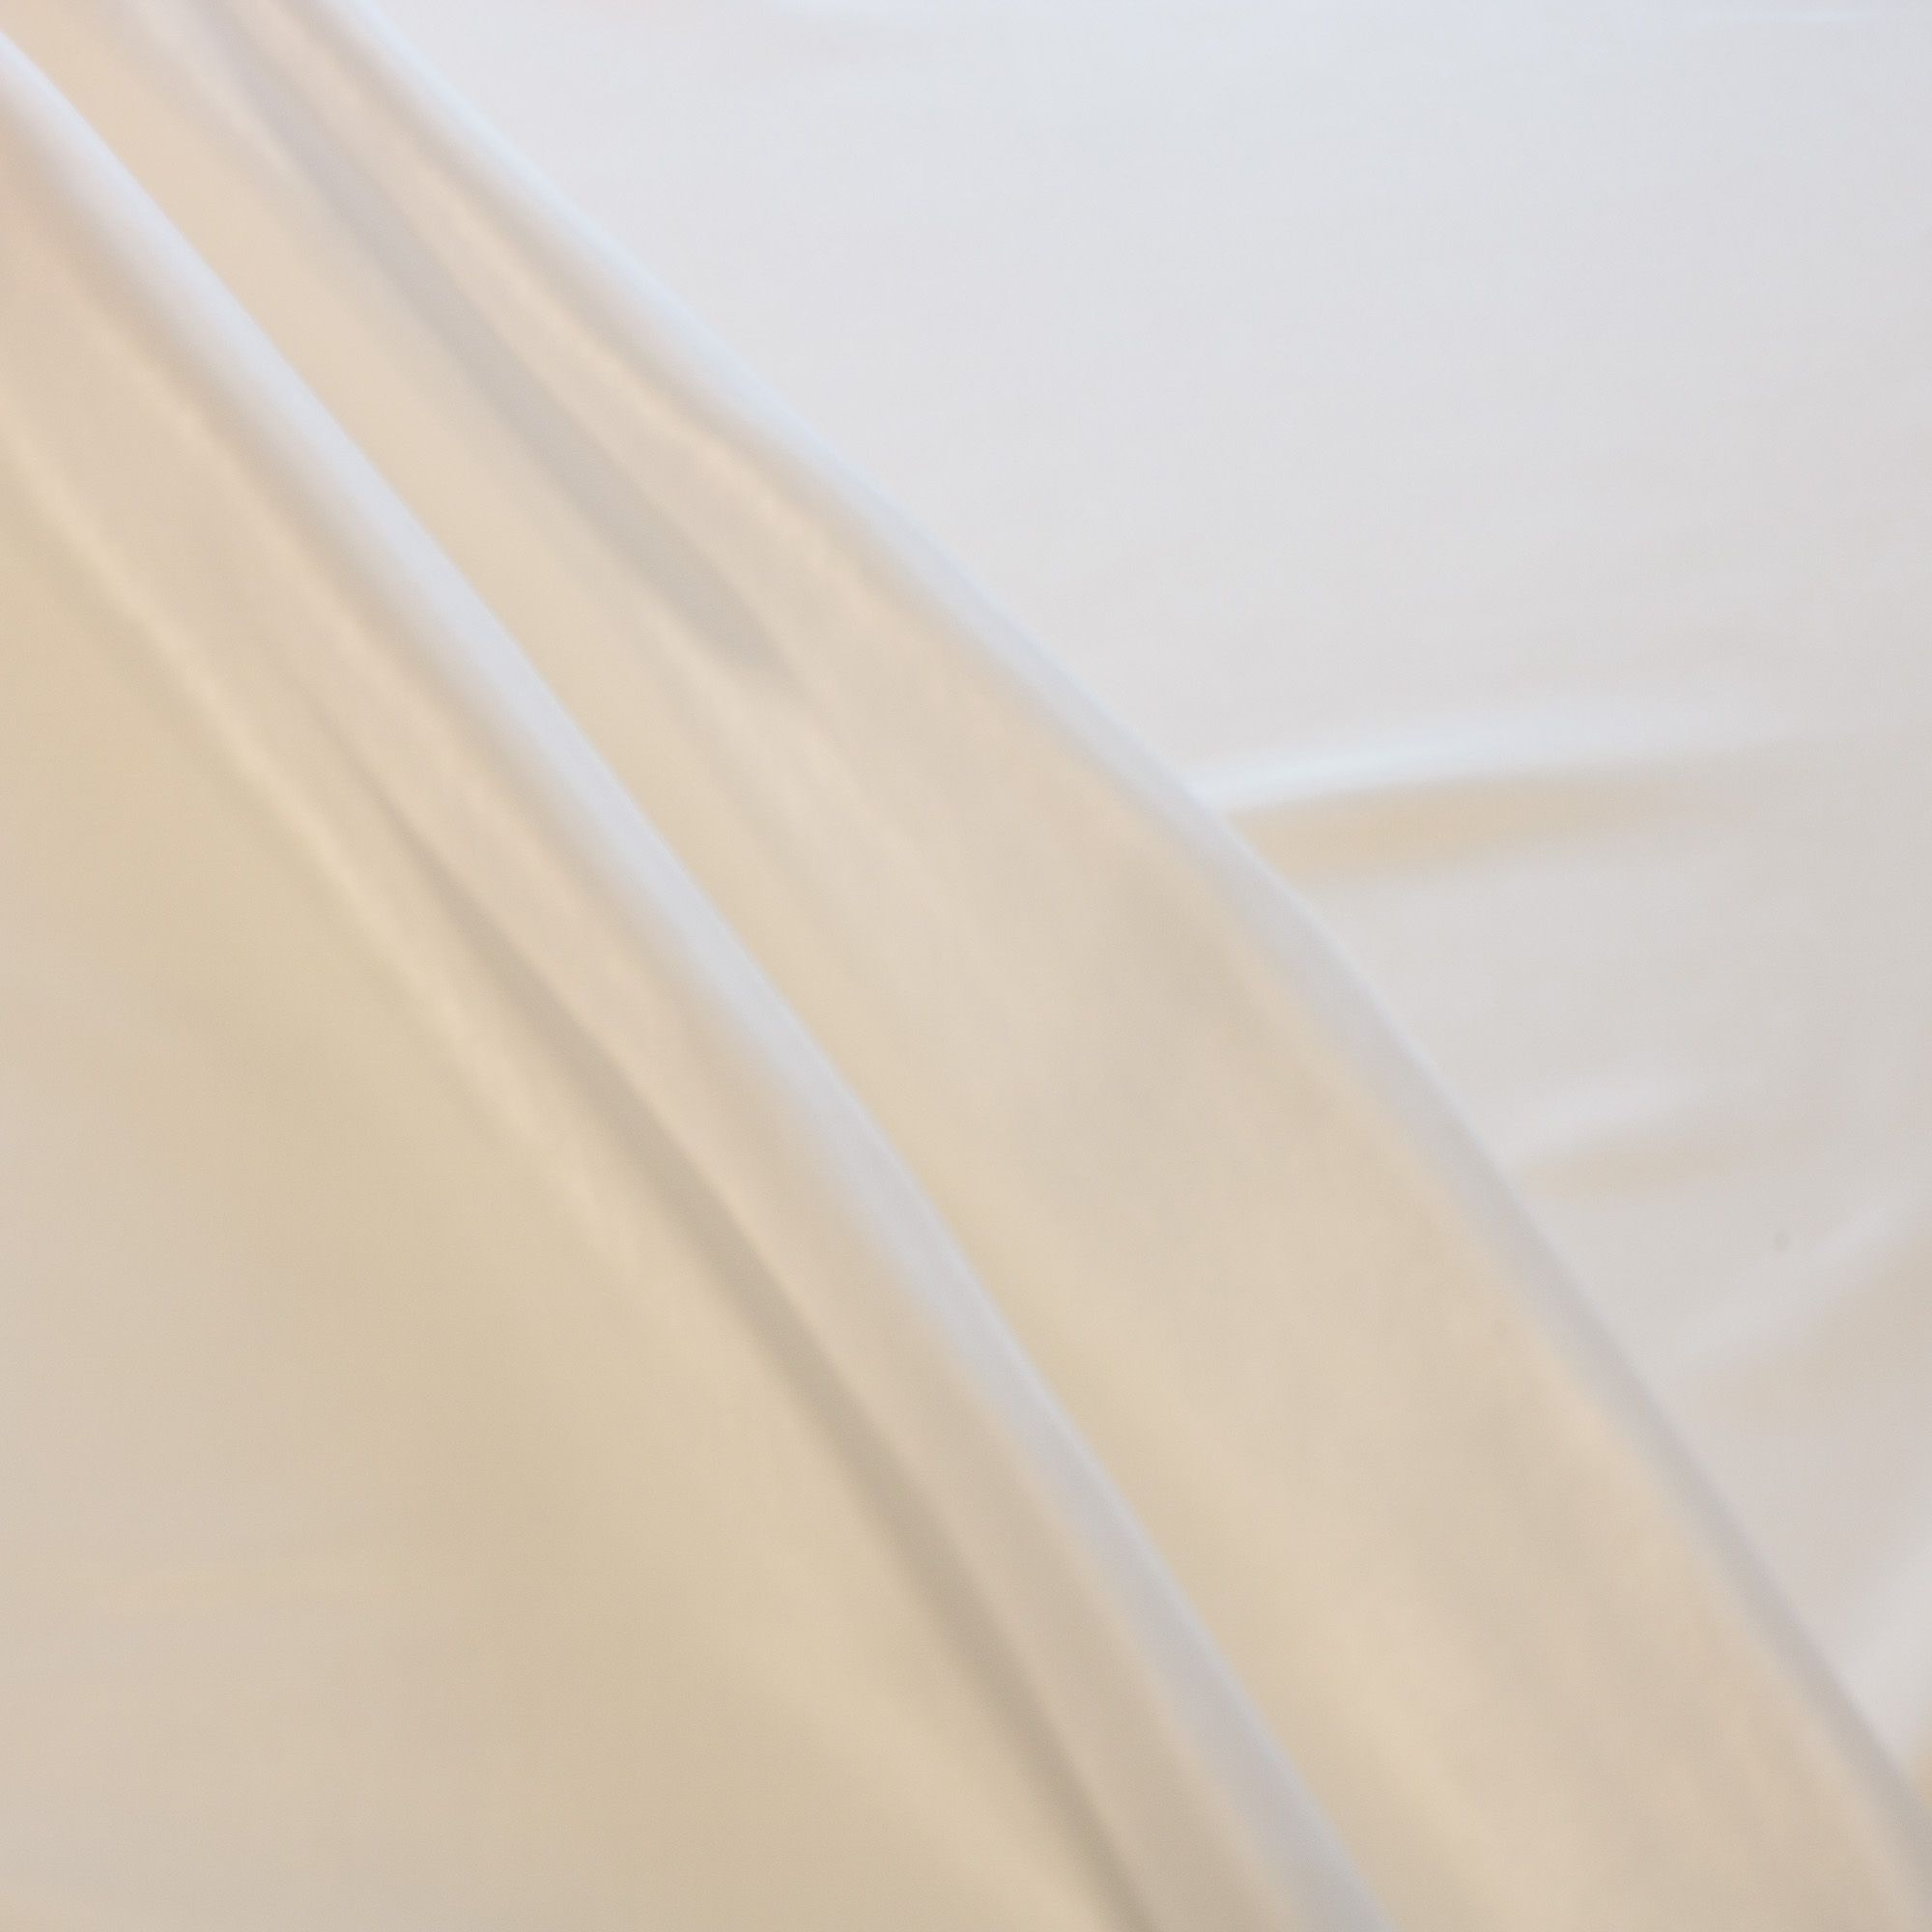 Tecido Bember 100% Poliester 1,50 Mt Largura Branco